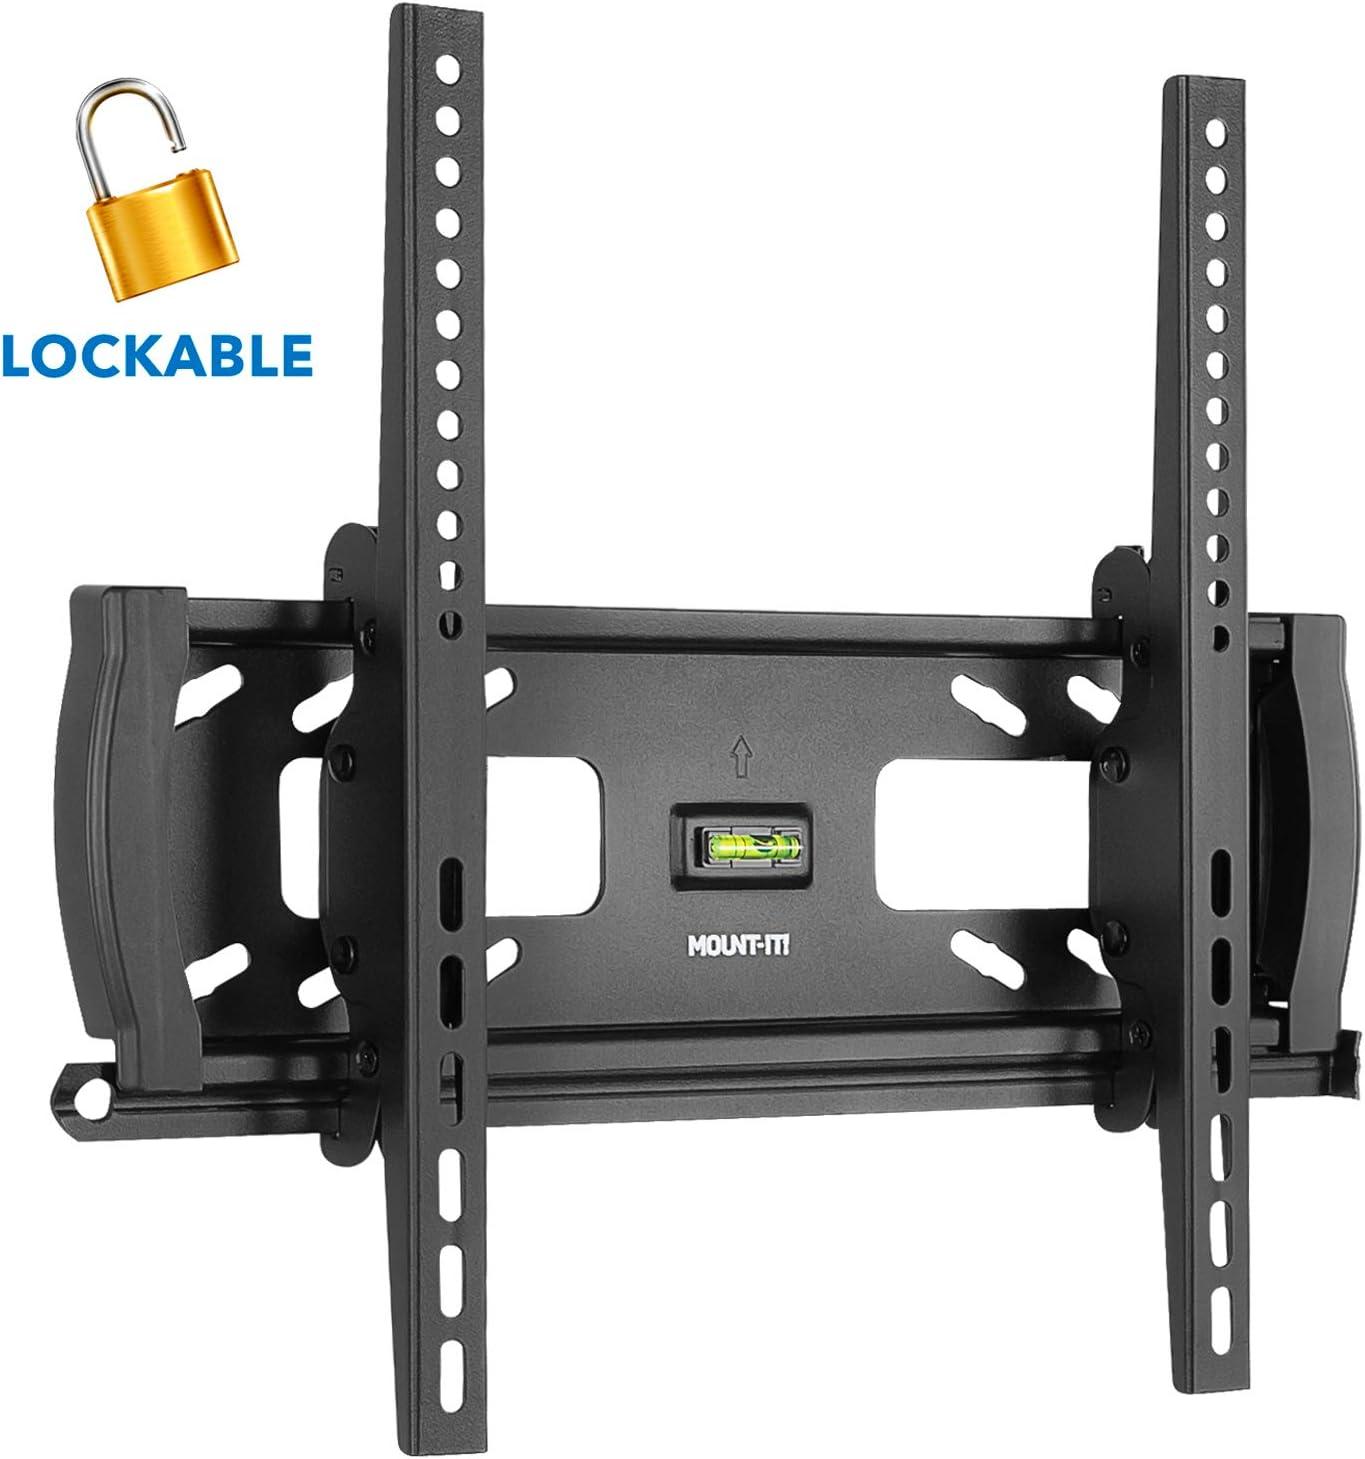 "B00LOU0CU8 Mount-It! Lockable Anti Theft Tilt TV Wall Mount, Locking Bar Security Wall Mount fits 32"" to 55"" Flat Screen LCD LED Plasma TVs, up to 99 lbs (MI-2244T) 71S14nV6yaL"